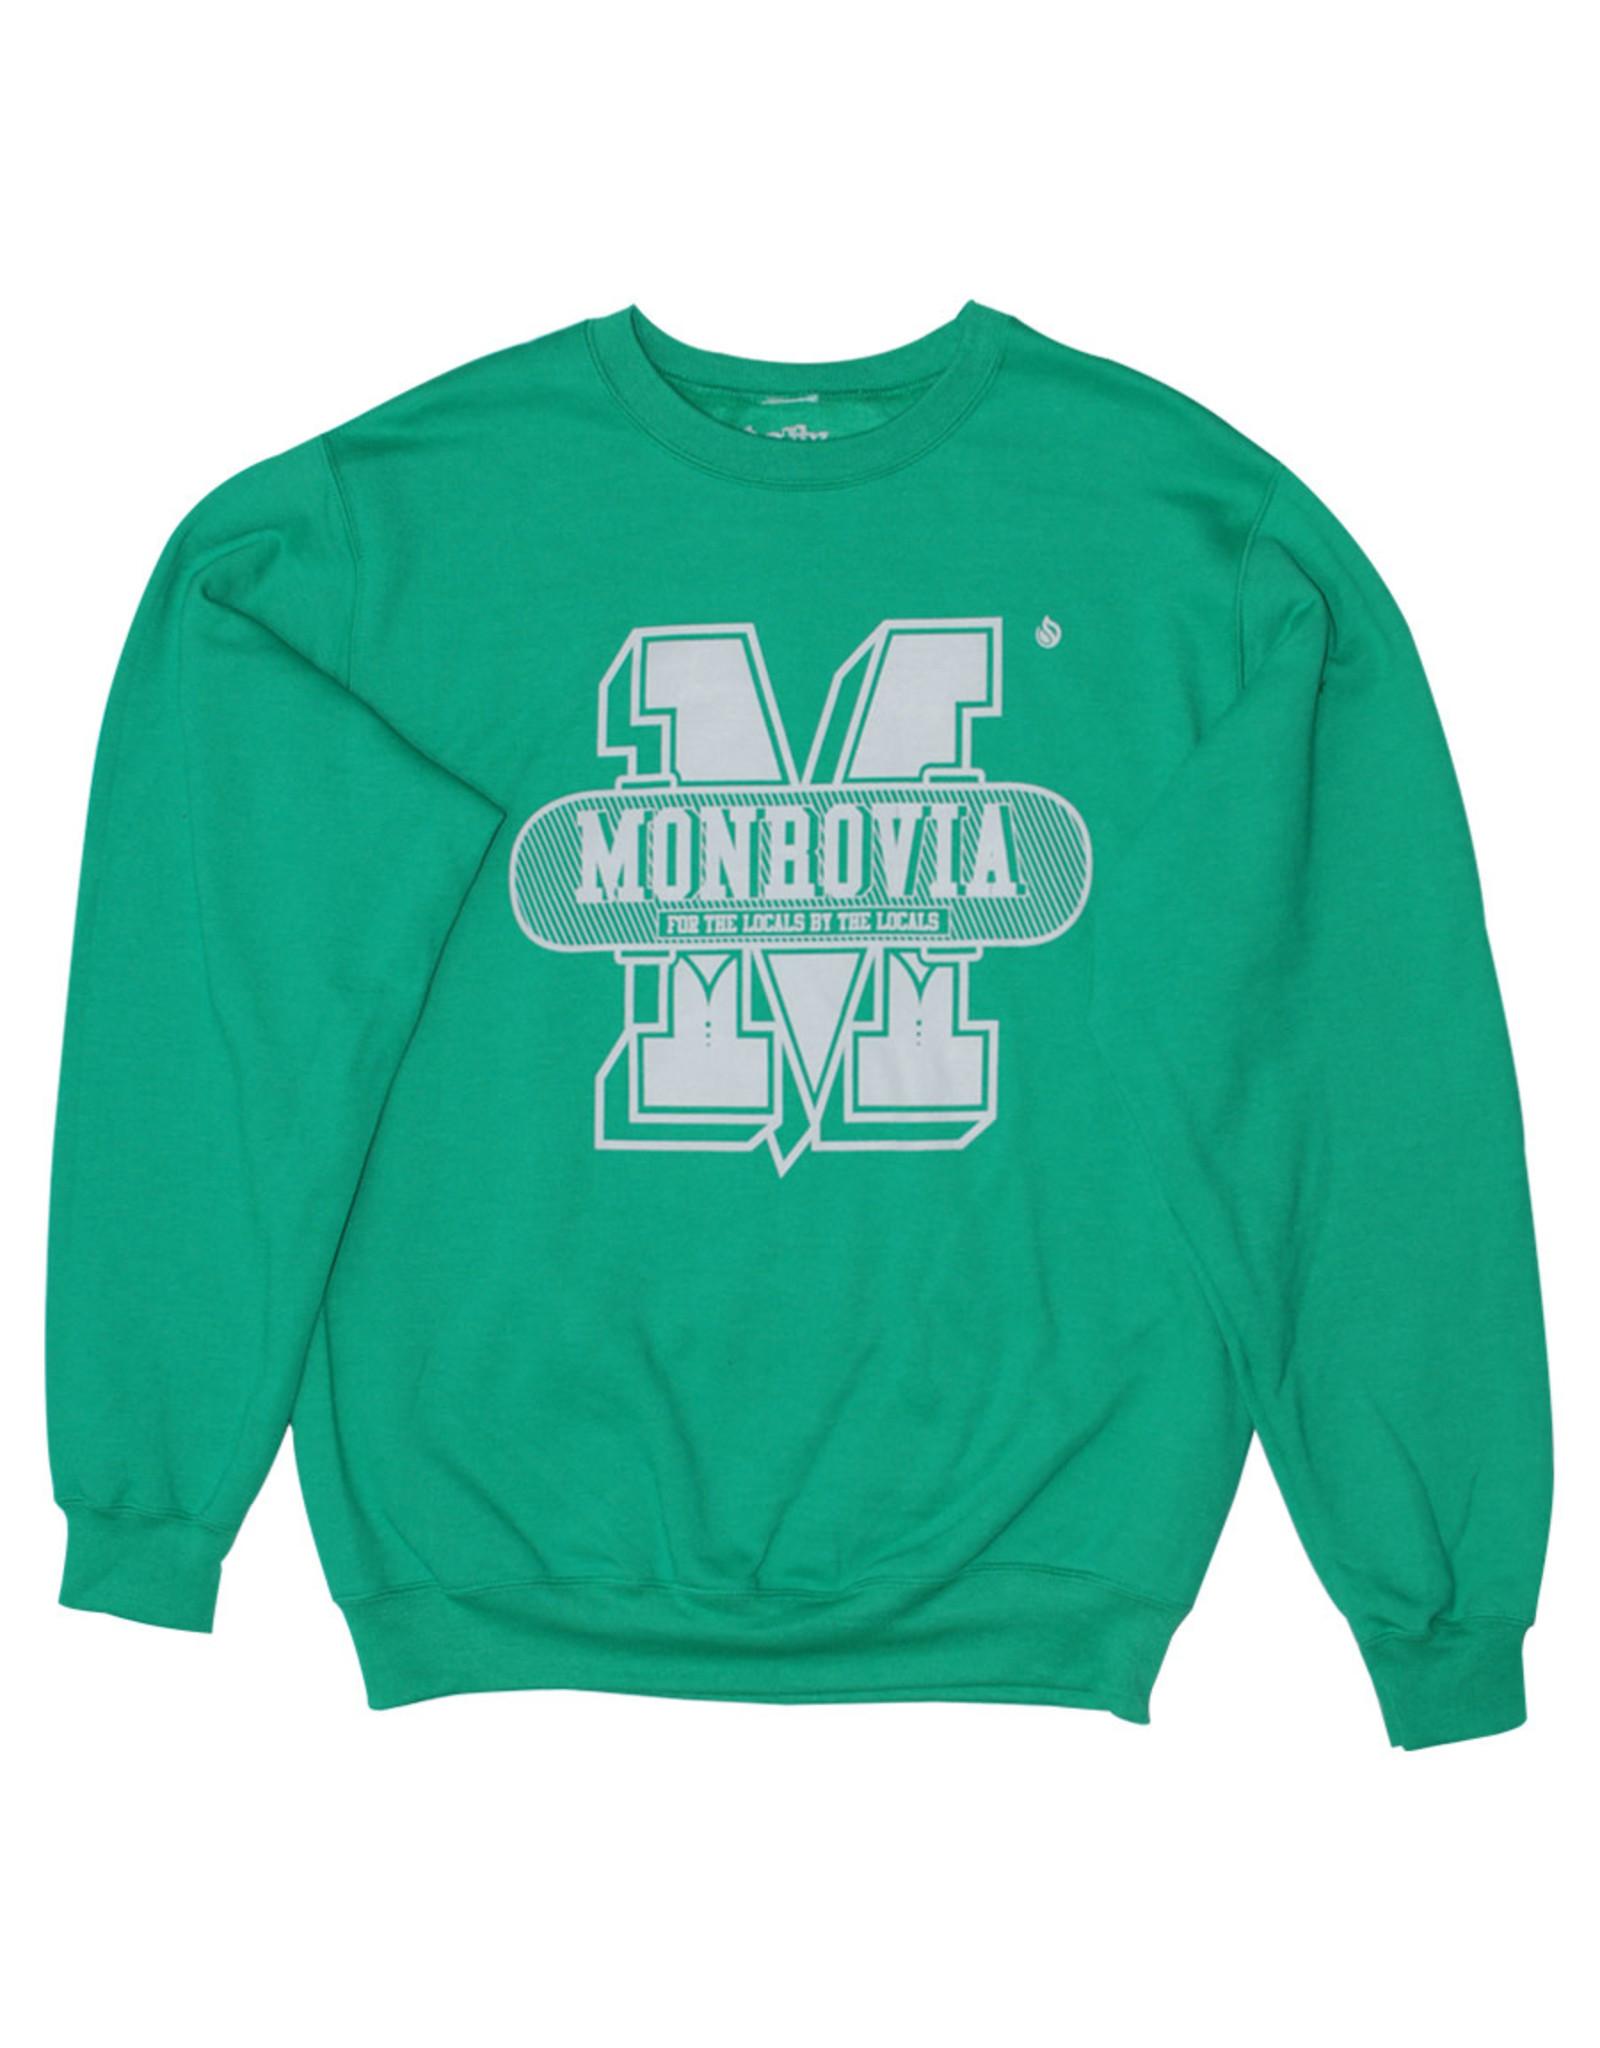 Stix Stix Monrovia Collegiate Sweater (Kelly Green/Light Grey)